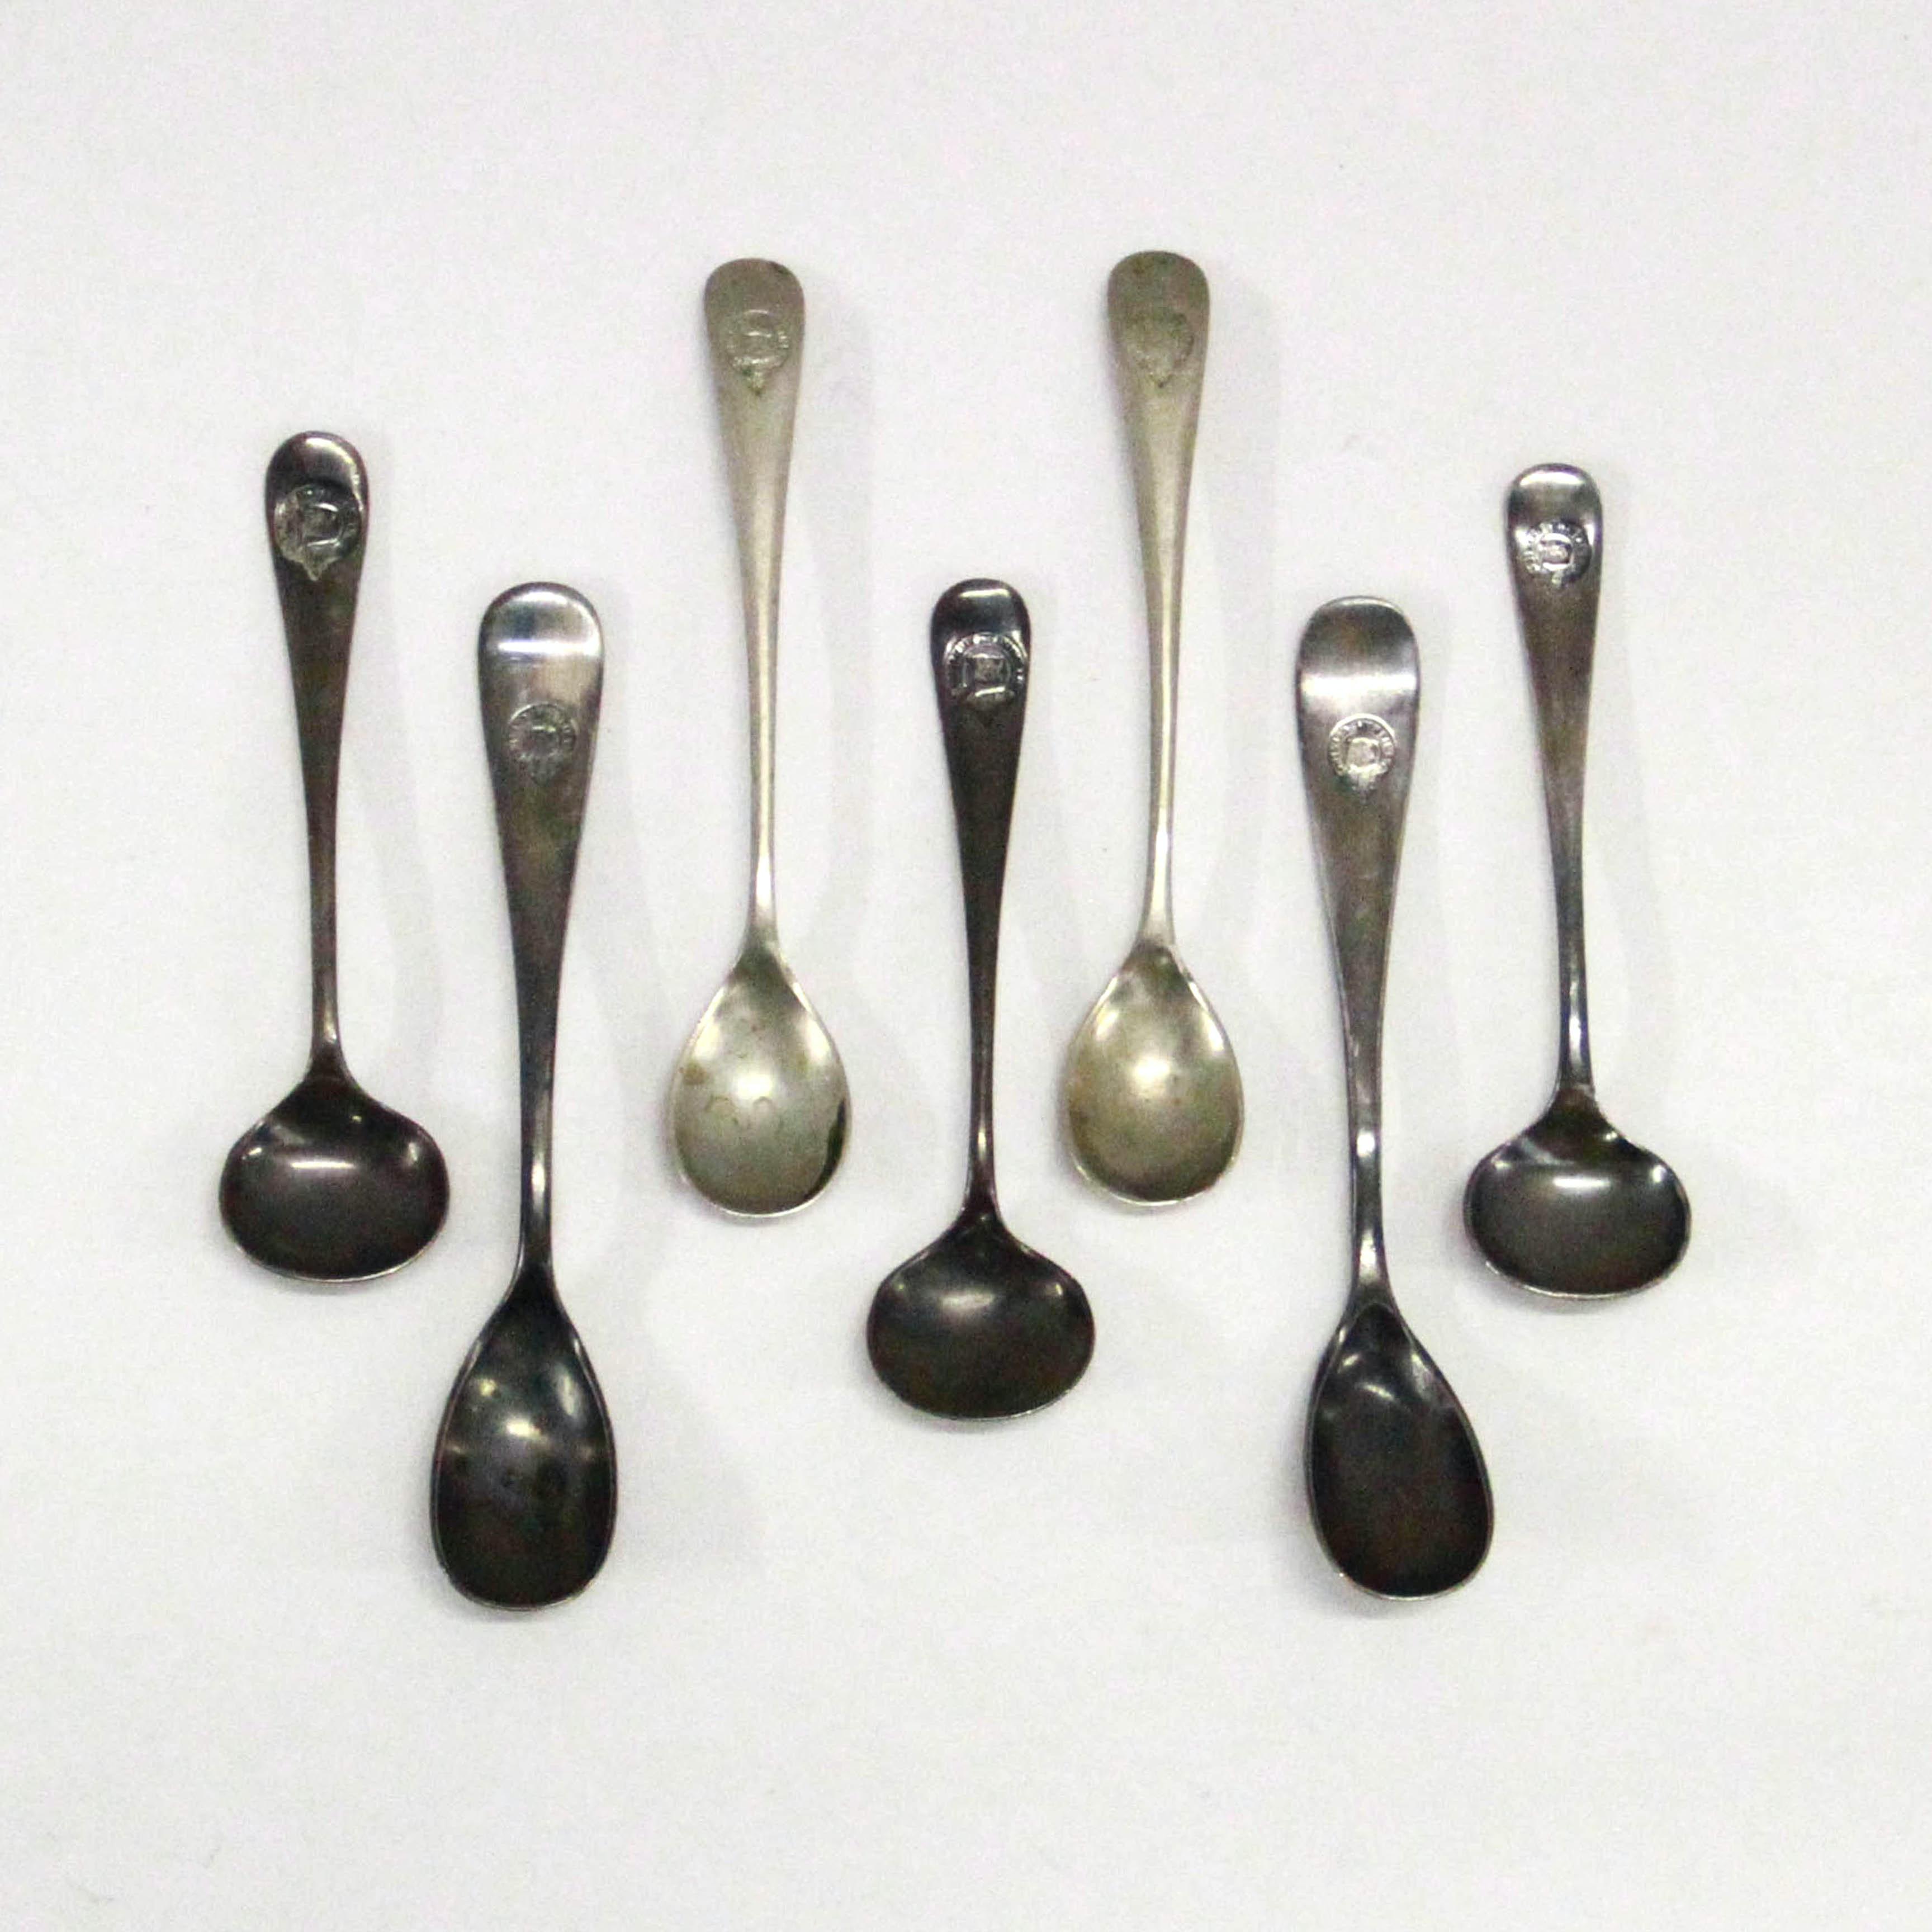 Walker & Hall Silver Plate Spoons